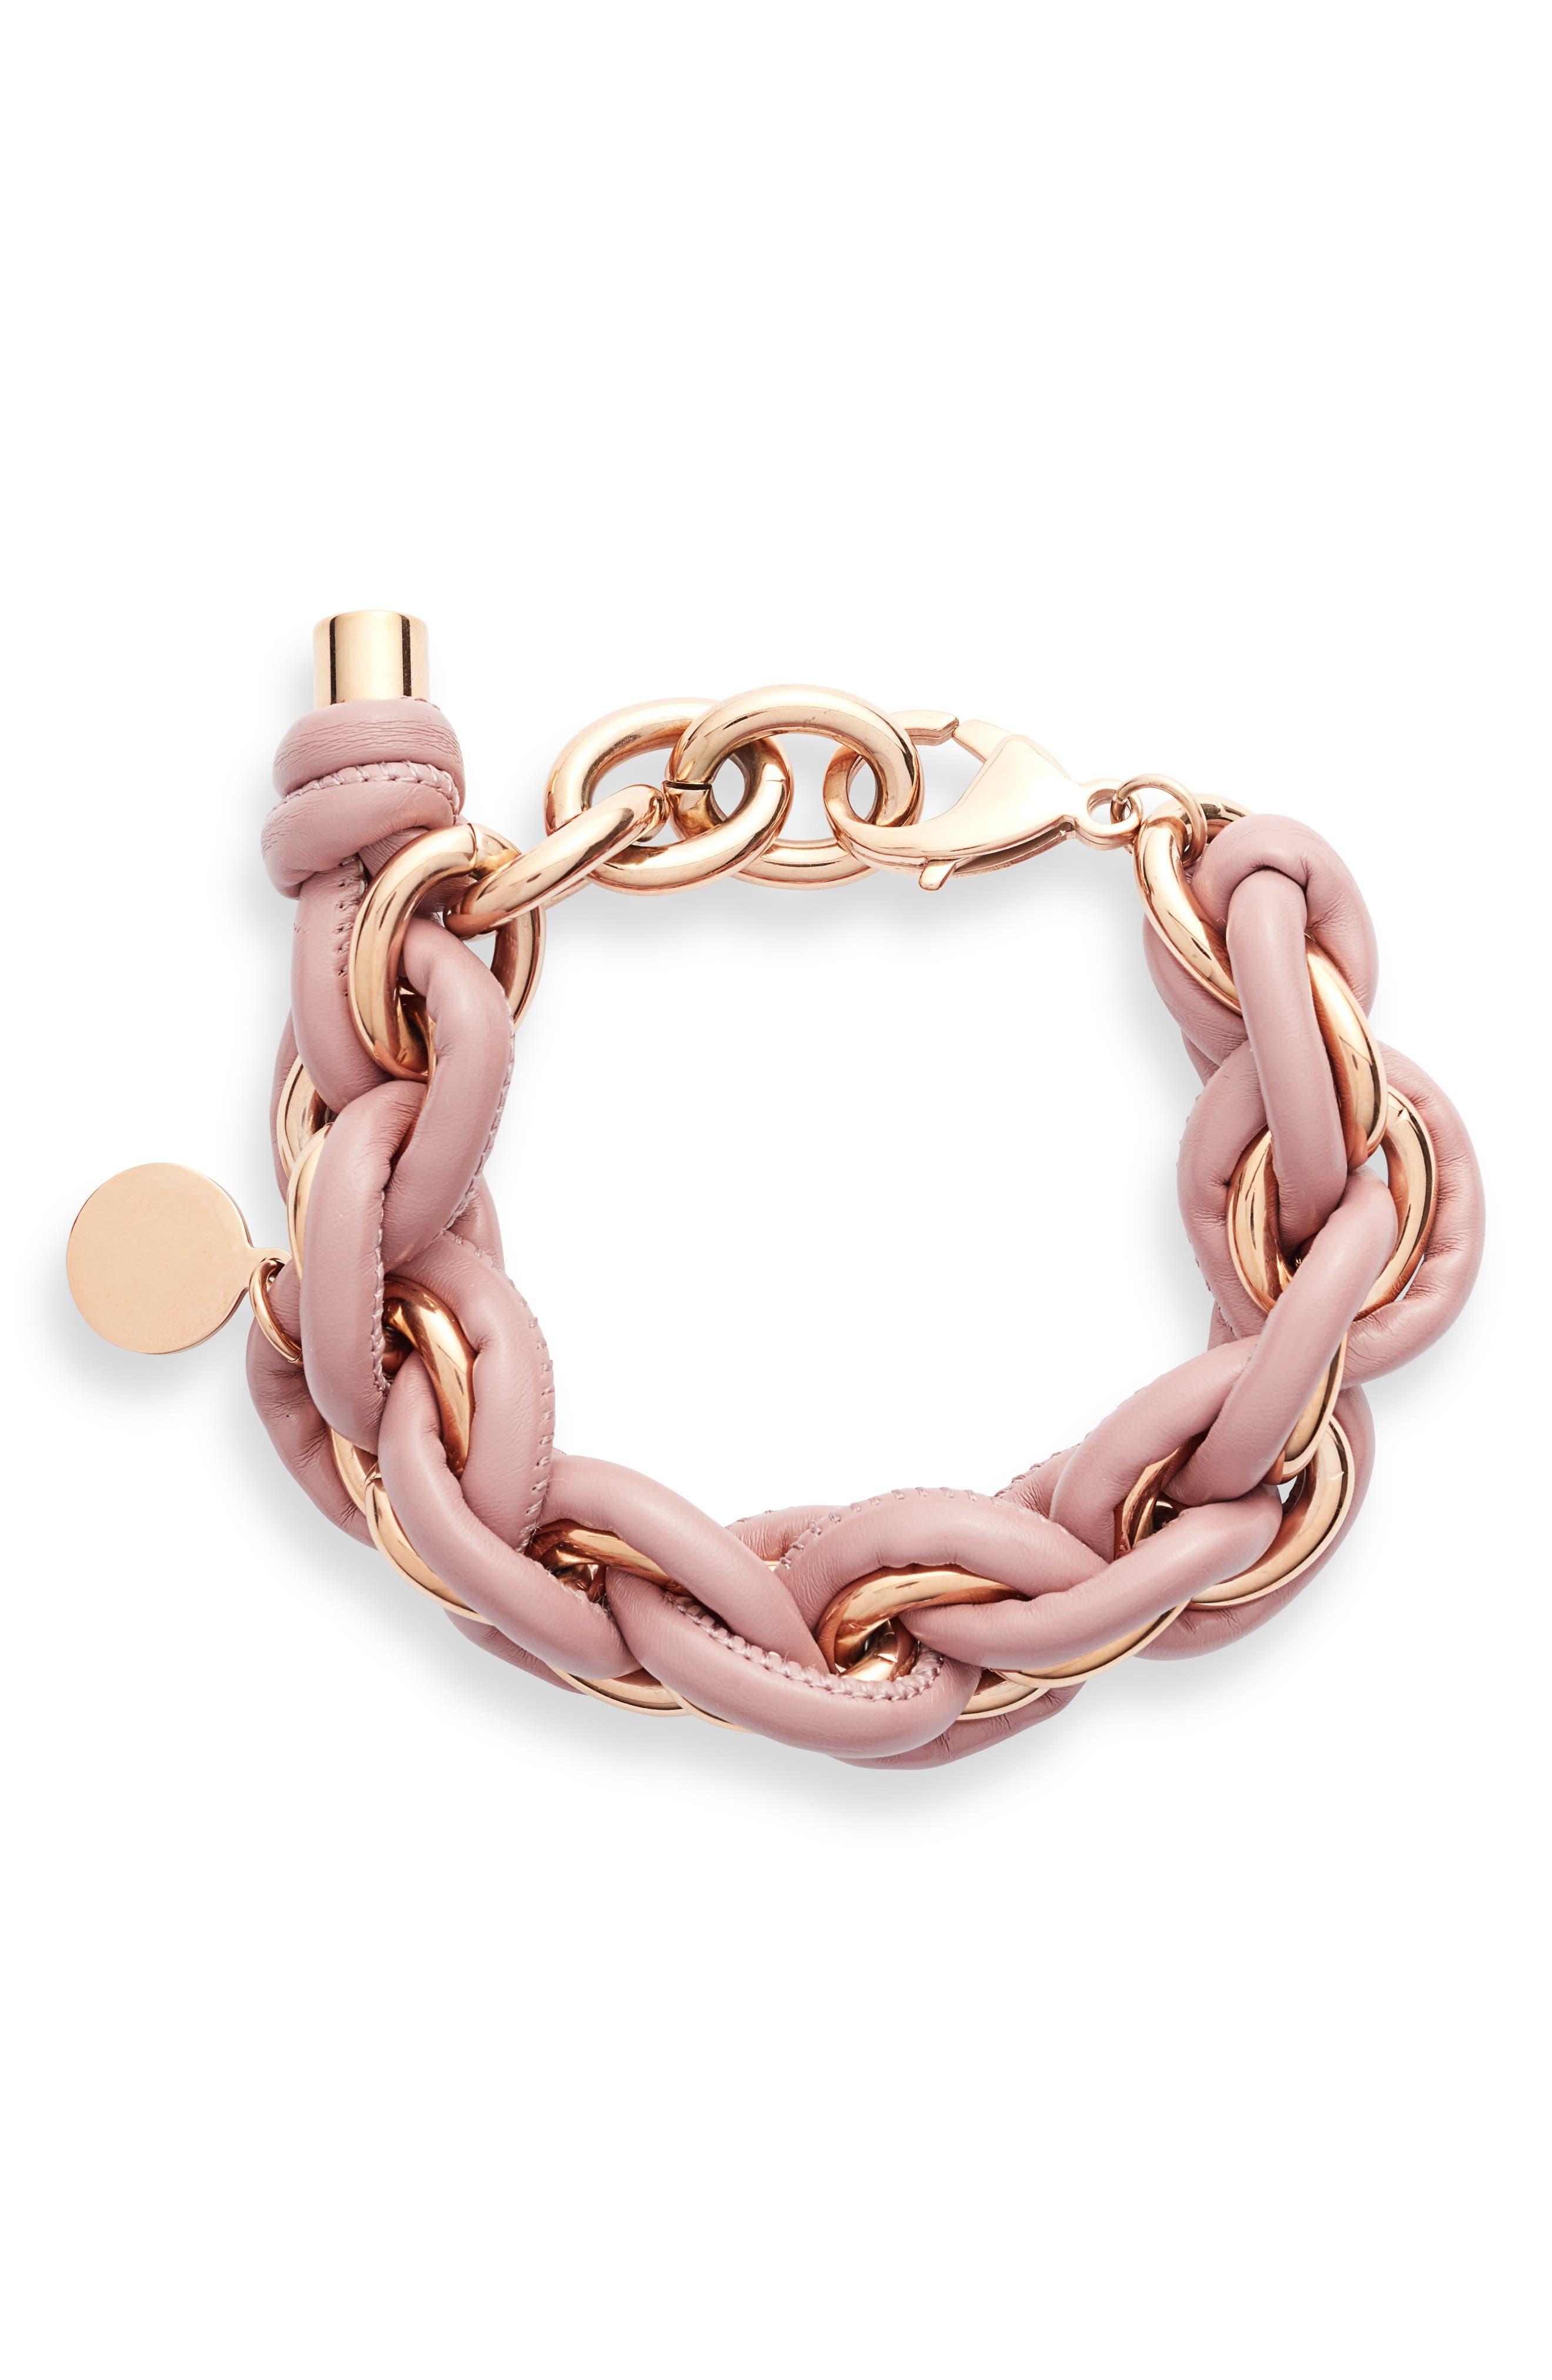 Leather Wrap Chain Bracelet